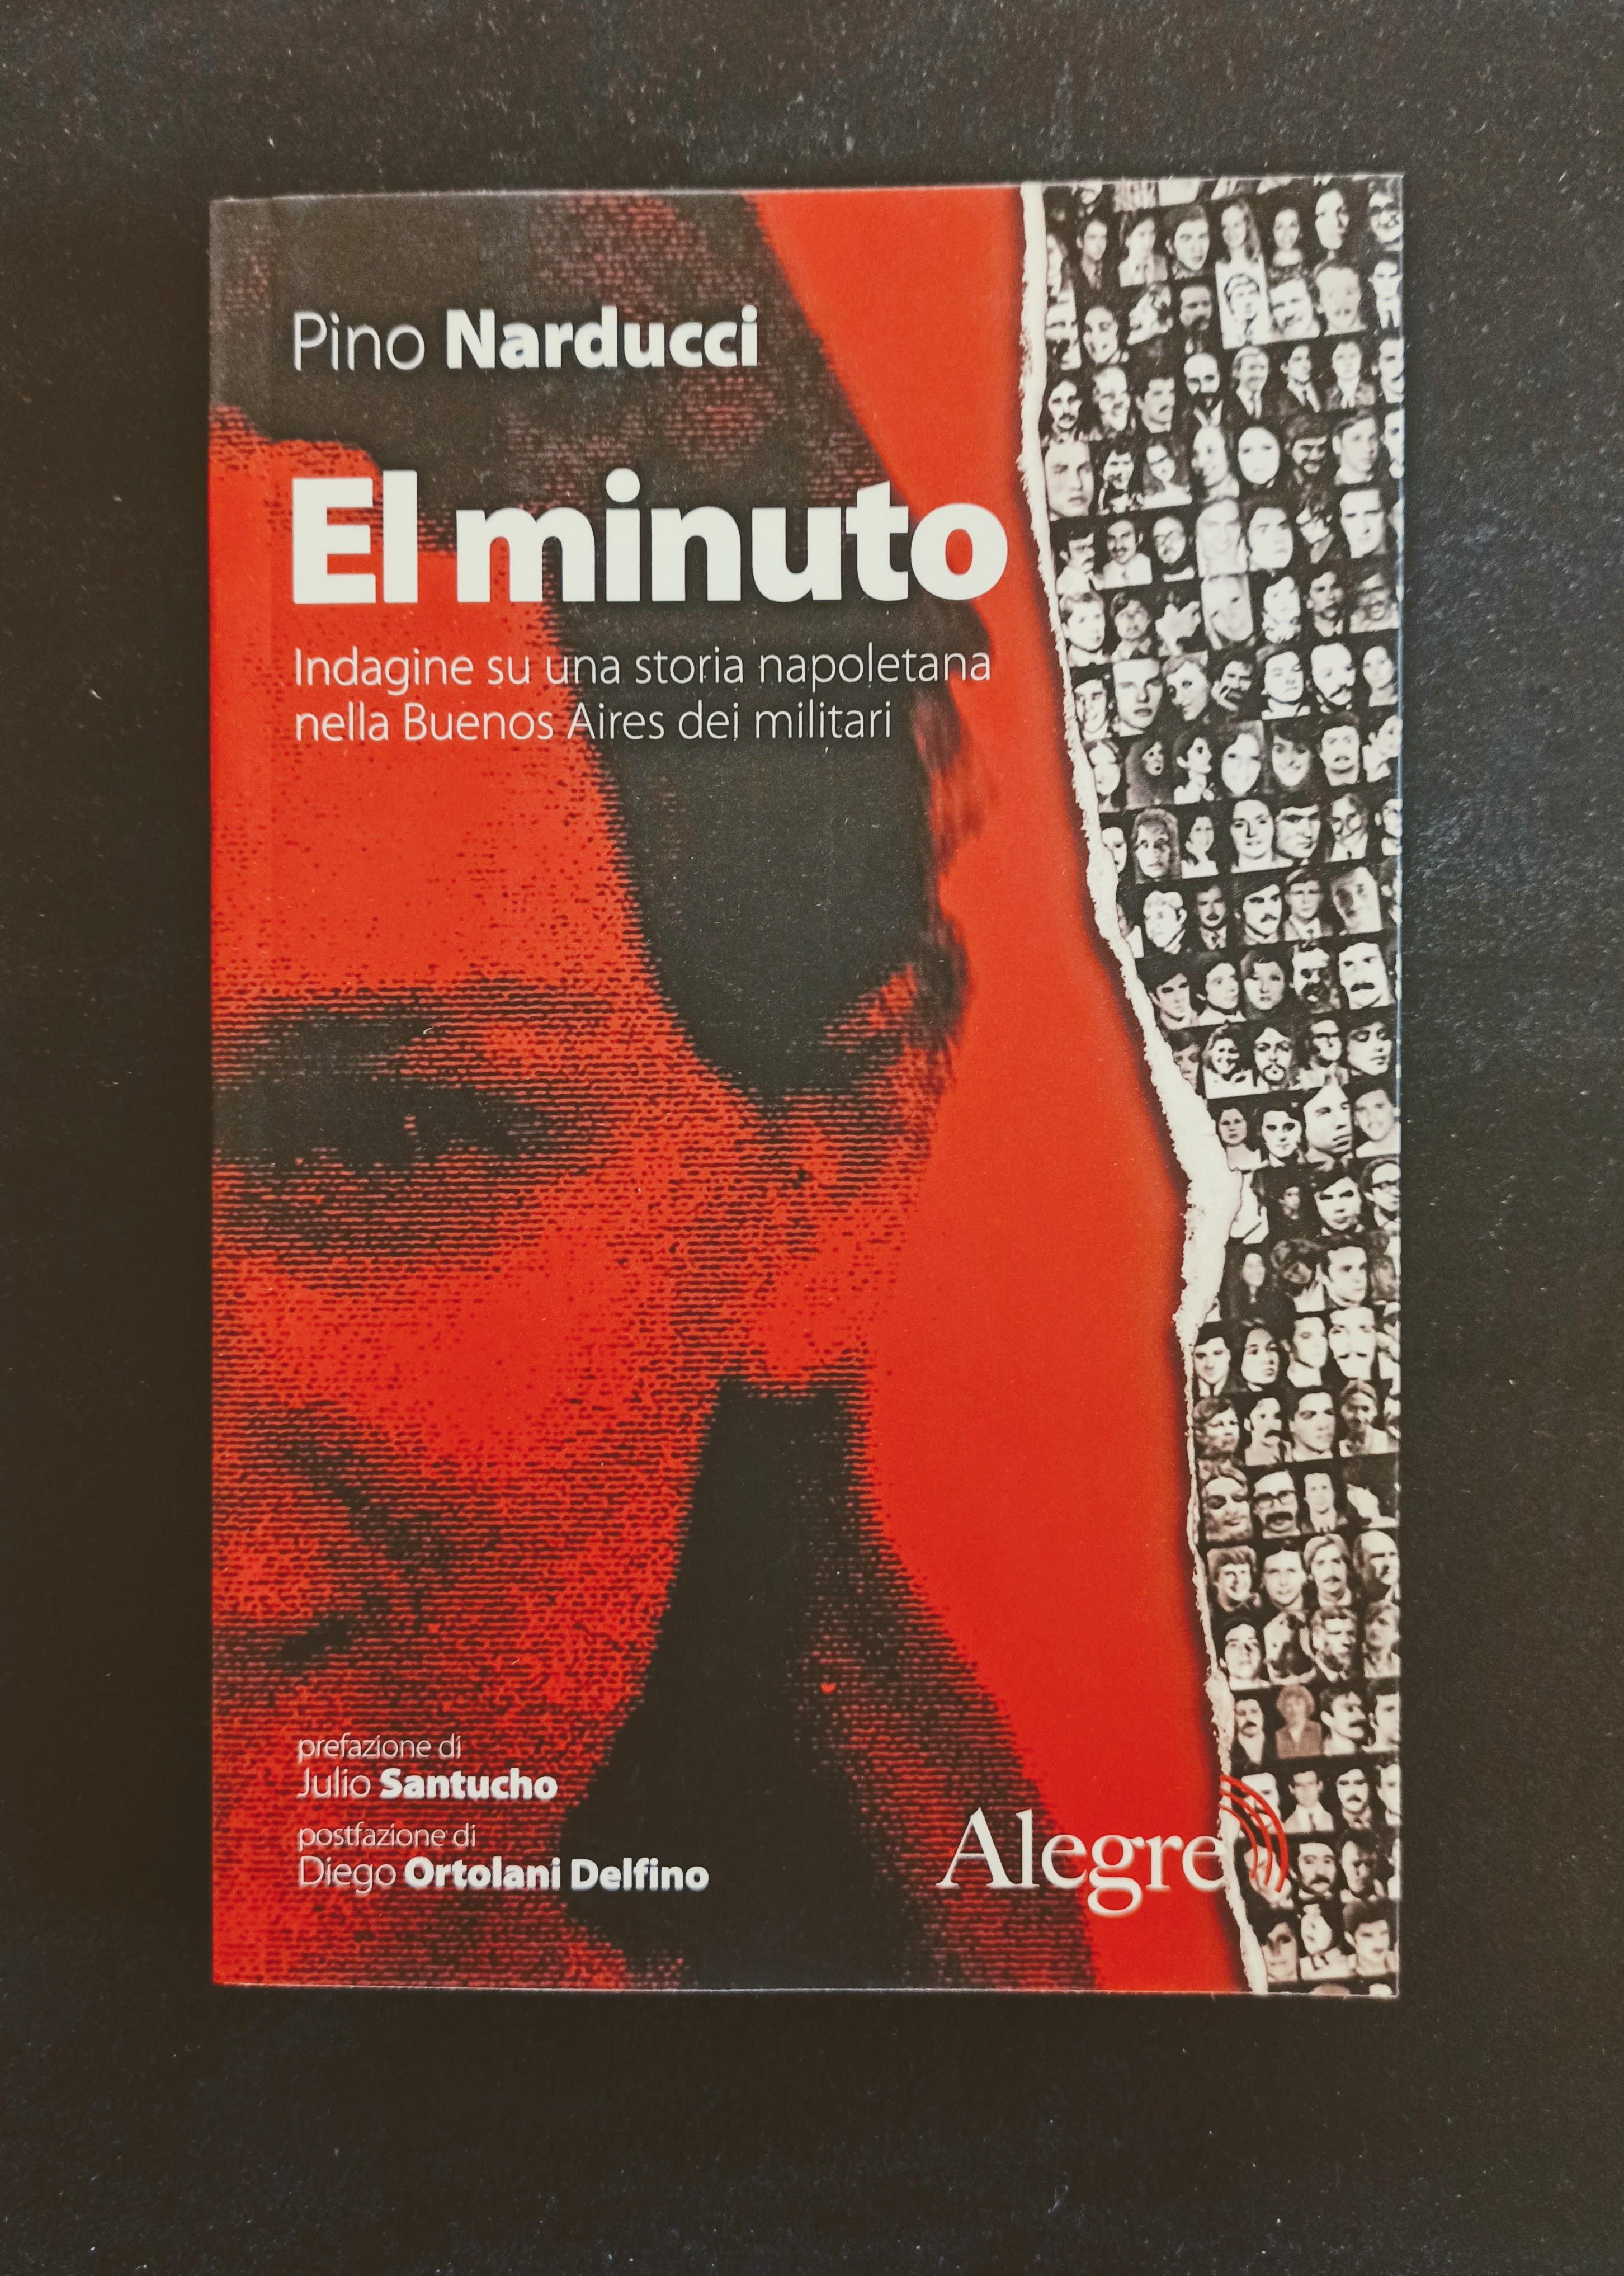 El minuto - Indagine su una storia napoletana nella Buenos Aires dei militari